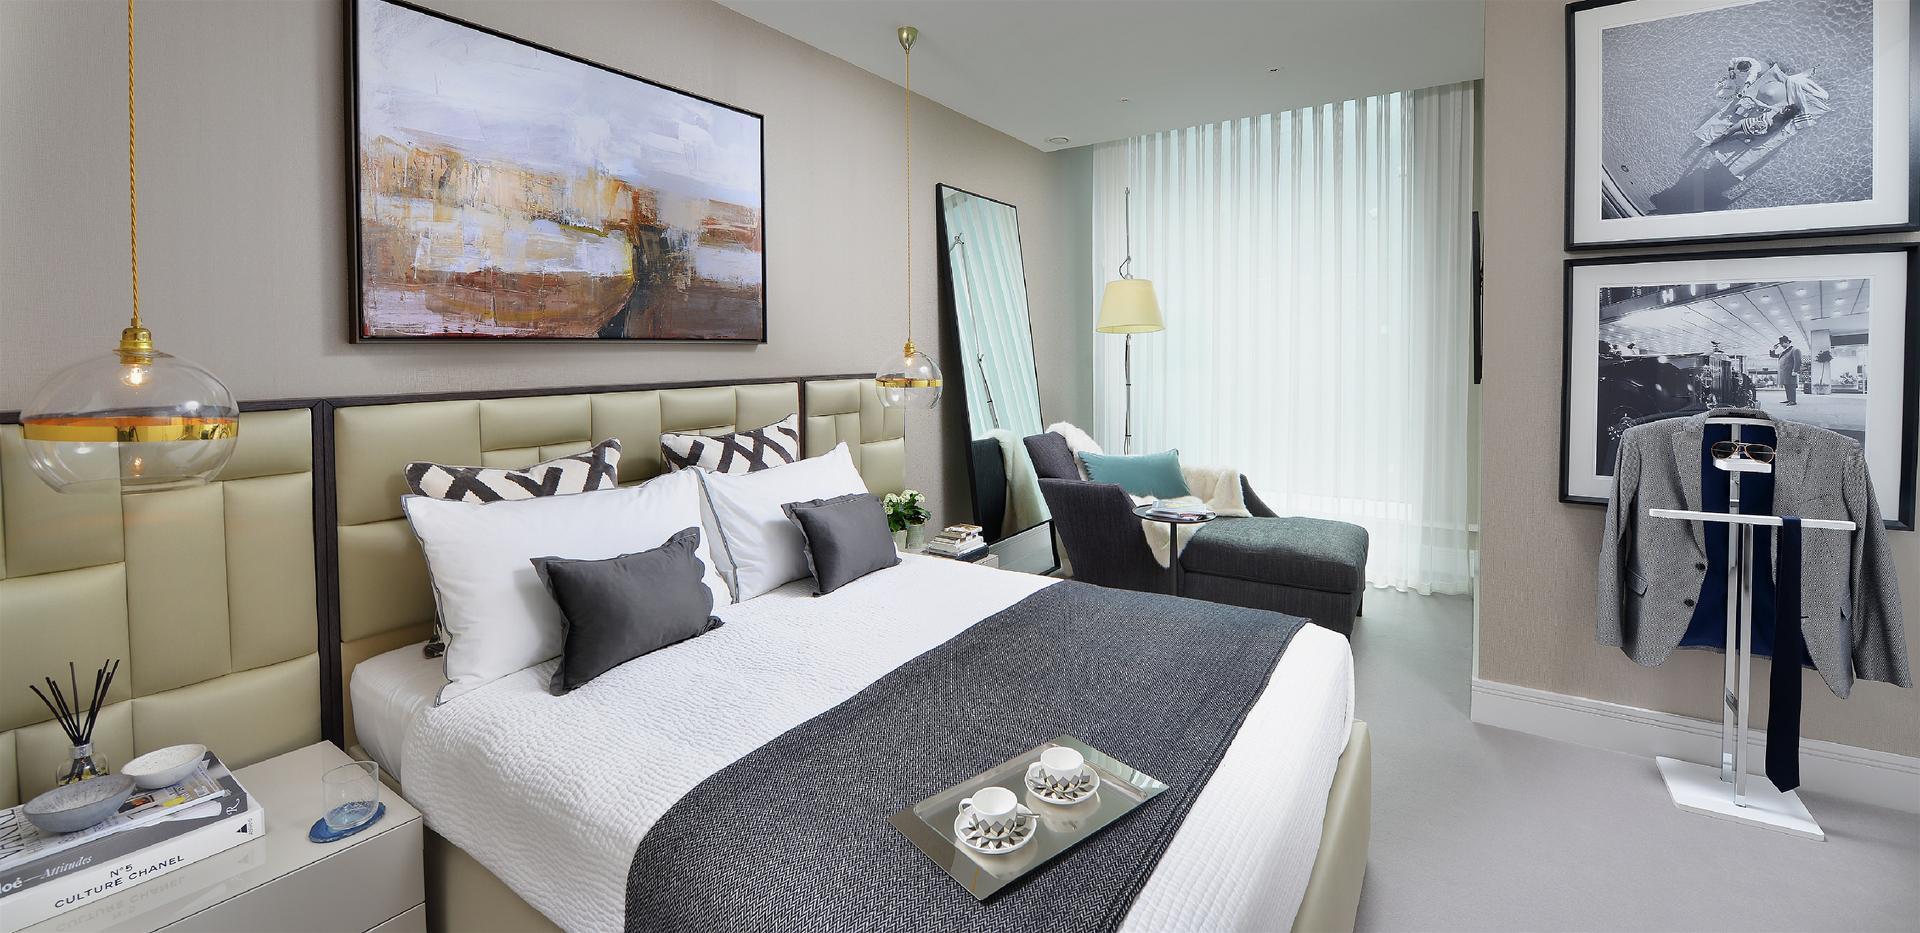 Berkeley, 250 City Road, Islington, Interior, Show Apartment, Master Bedroom